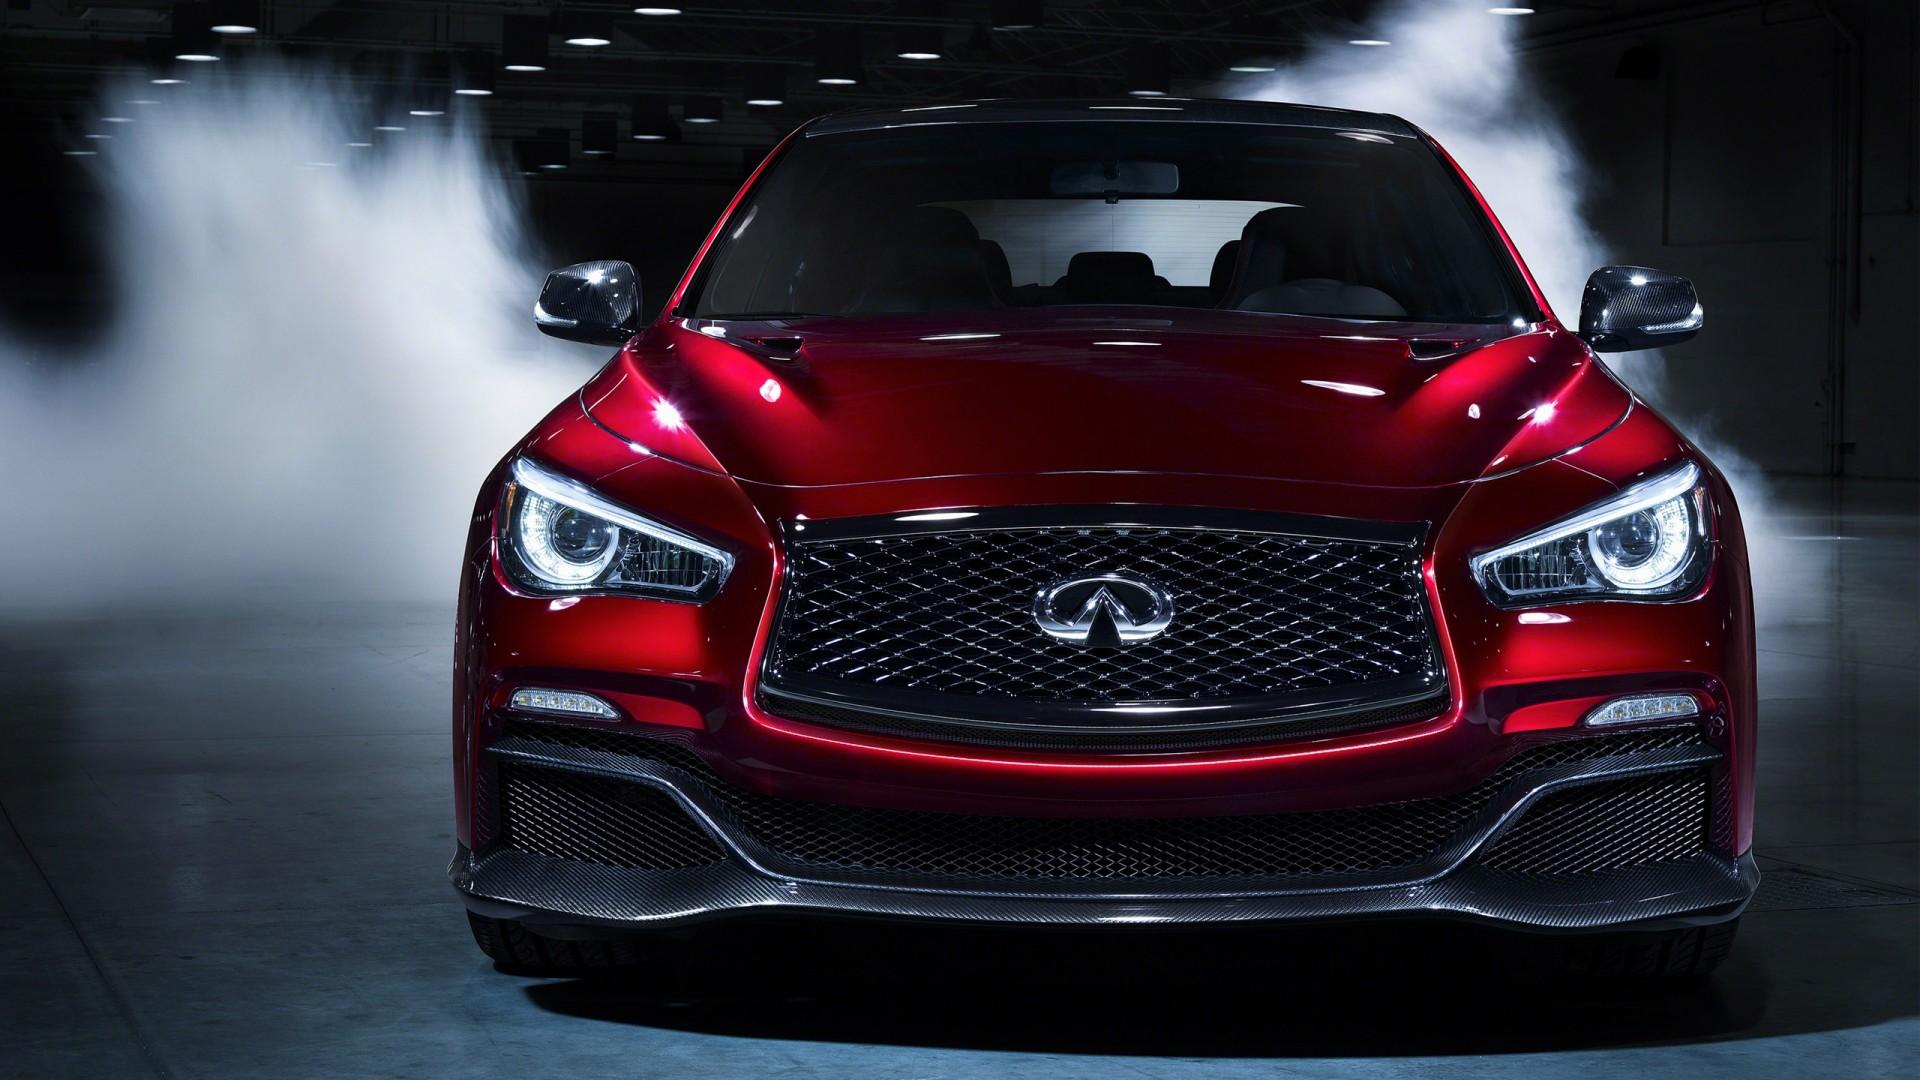 2018 Infiniti Qx50 Redesign >> Infiniti Q50 Eau Rouge Concept 2014 Wallpaper | HD Car Wallpapers | ID #4453